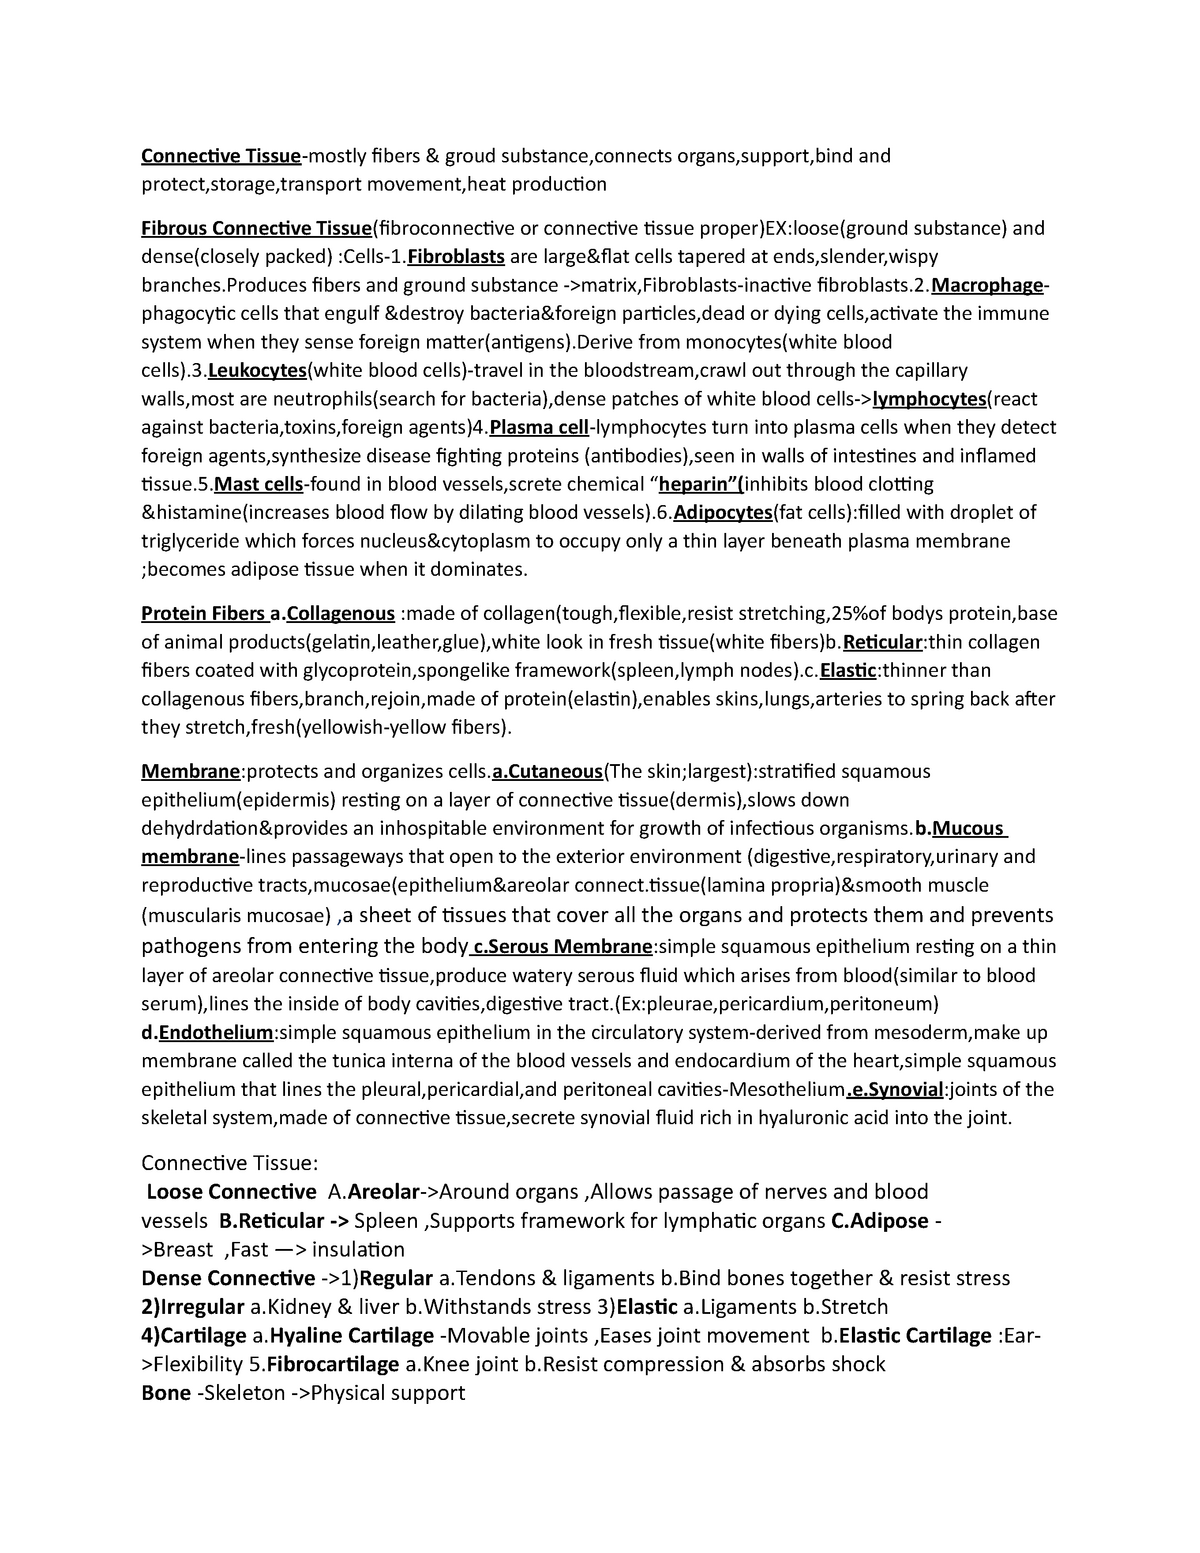 Connective Tissue - Anatomy - BIO 181: Anatomy And Physiology I